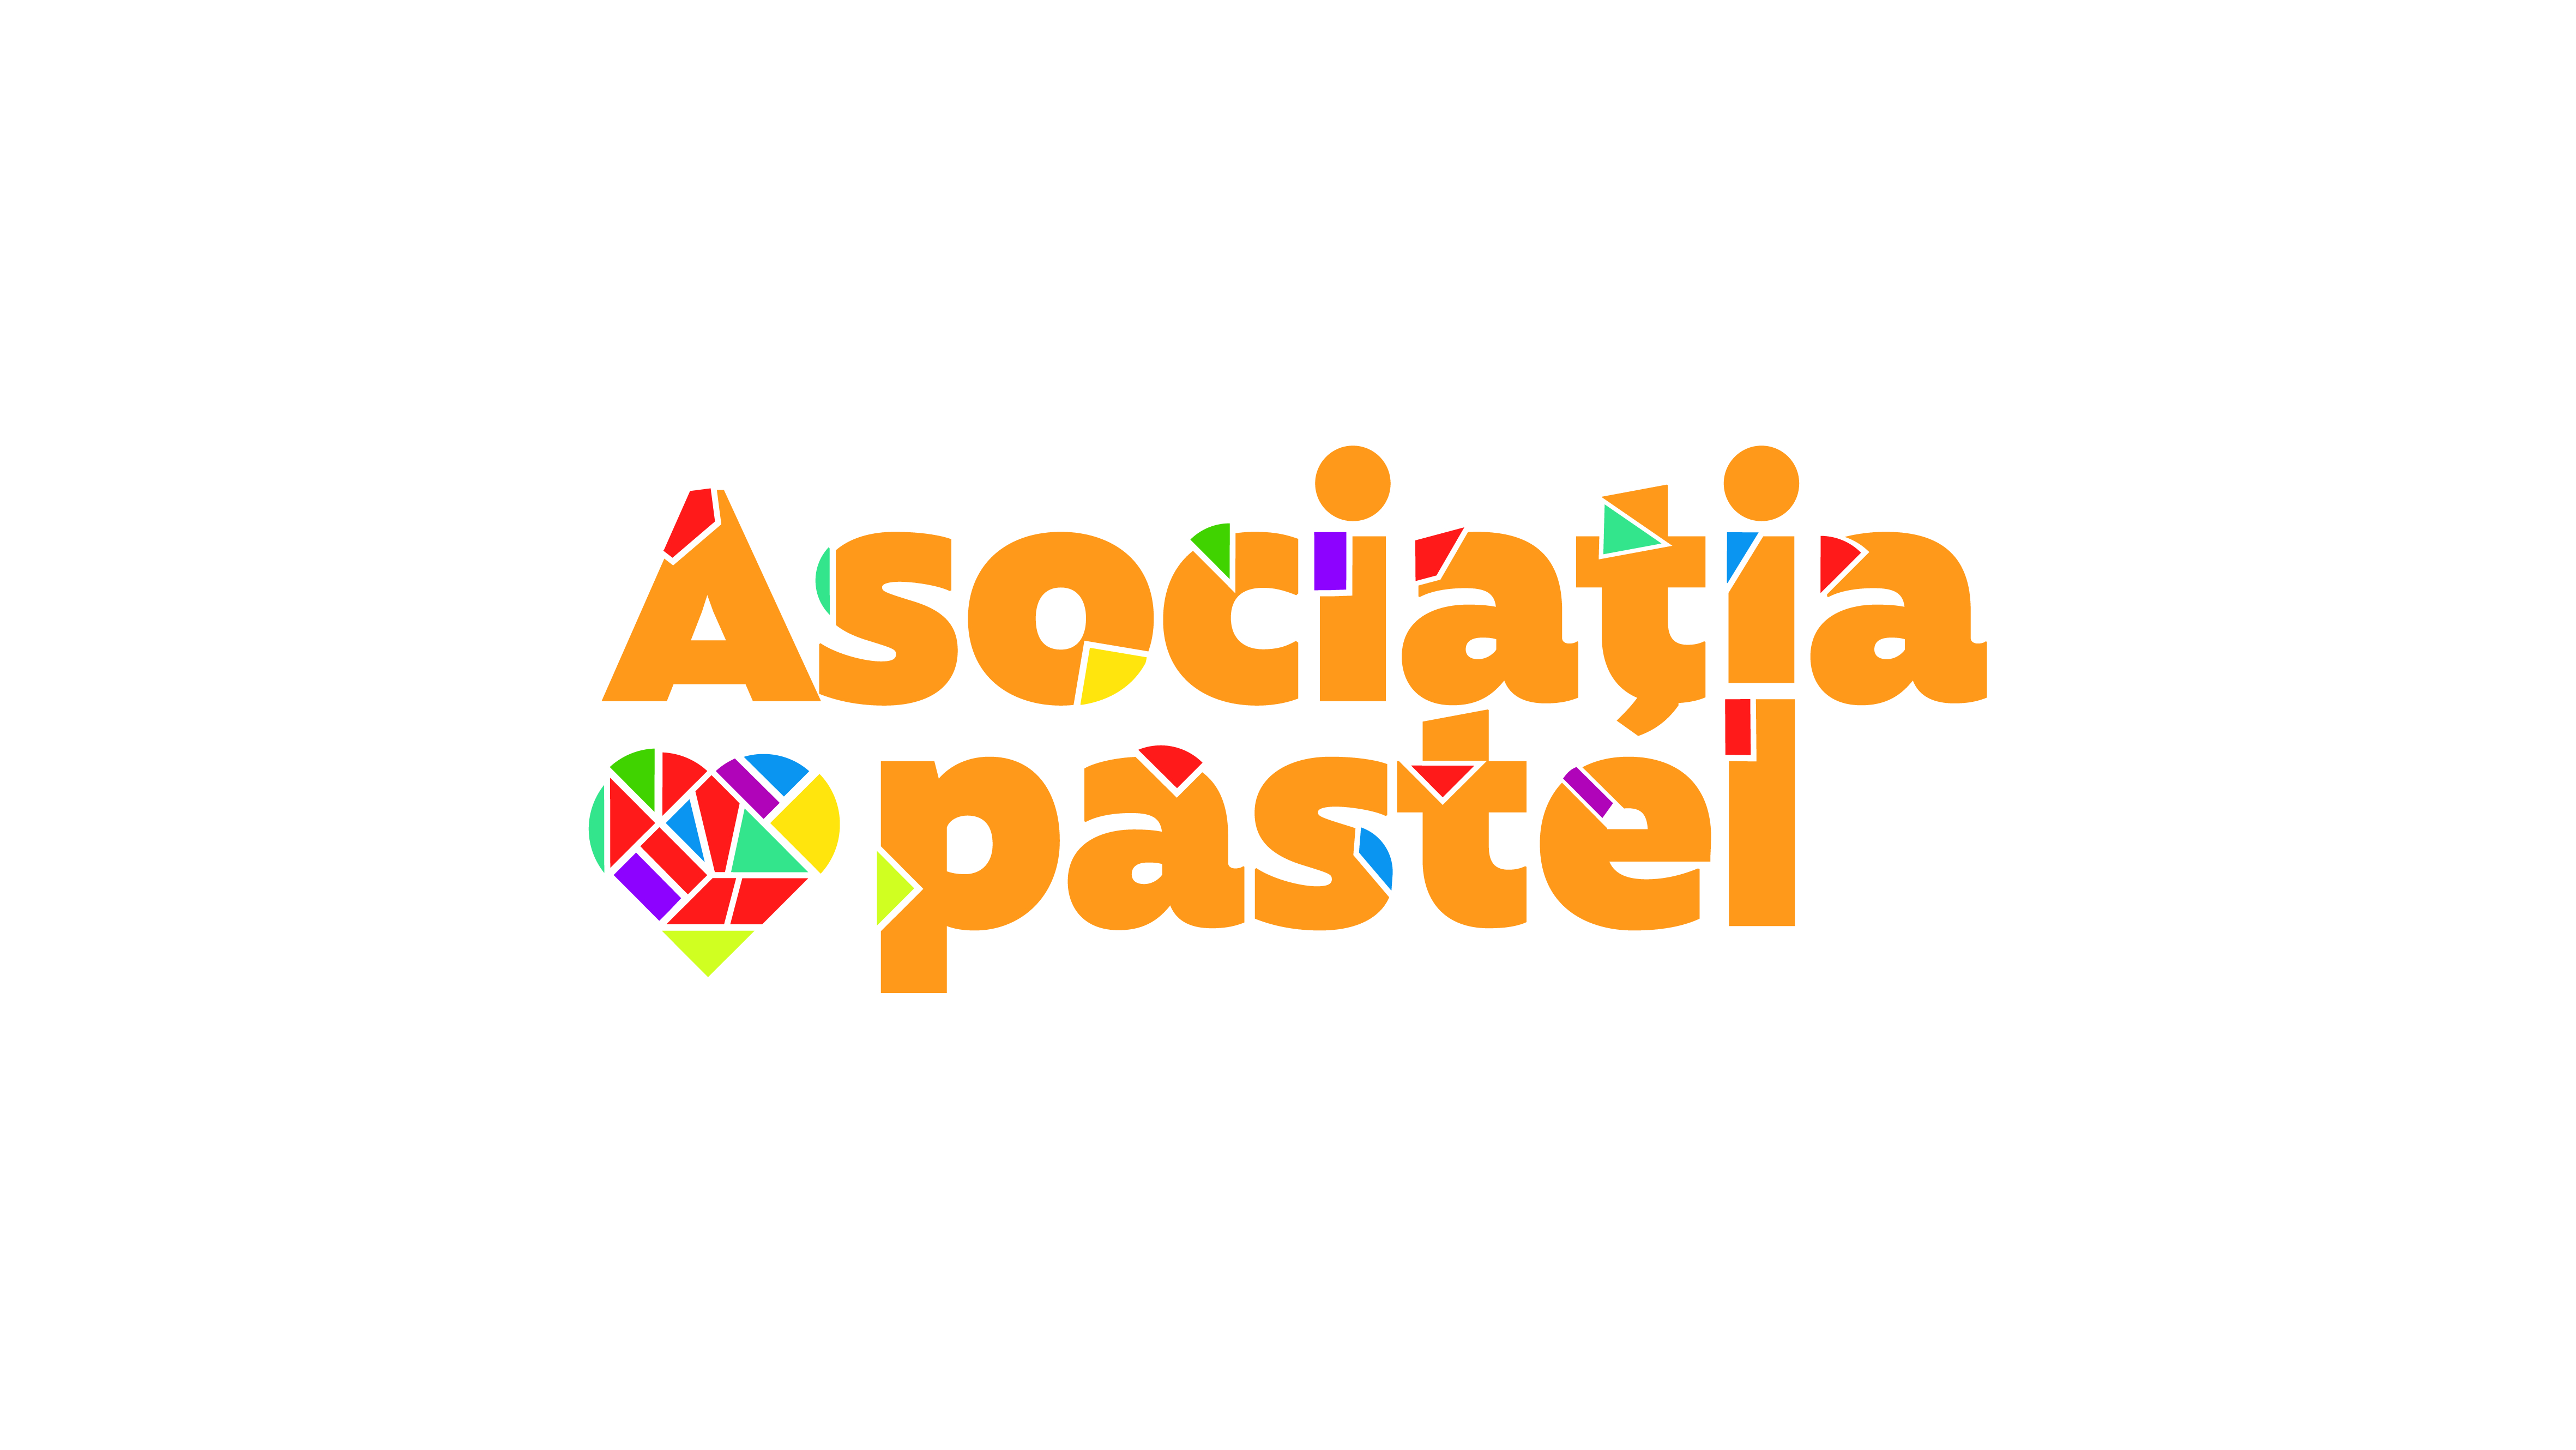 Asociatia pastel logo